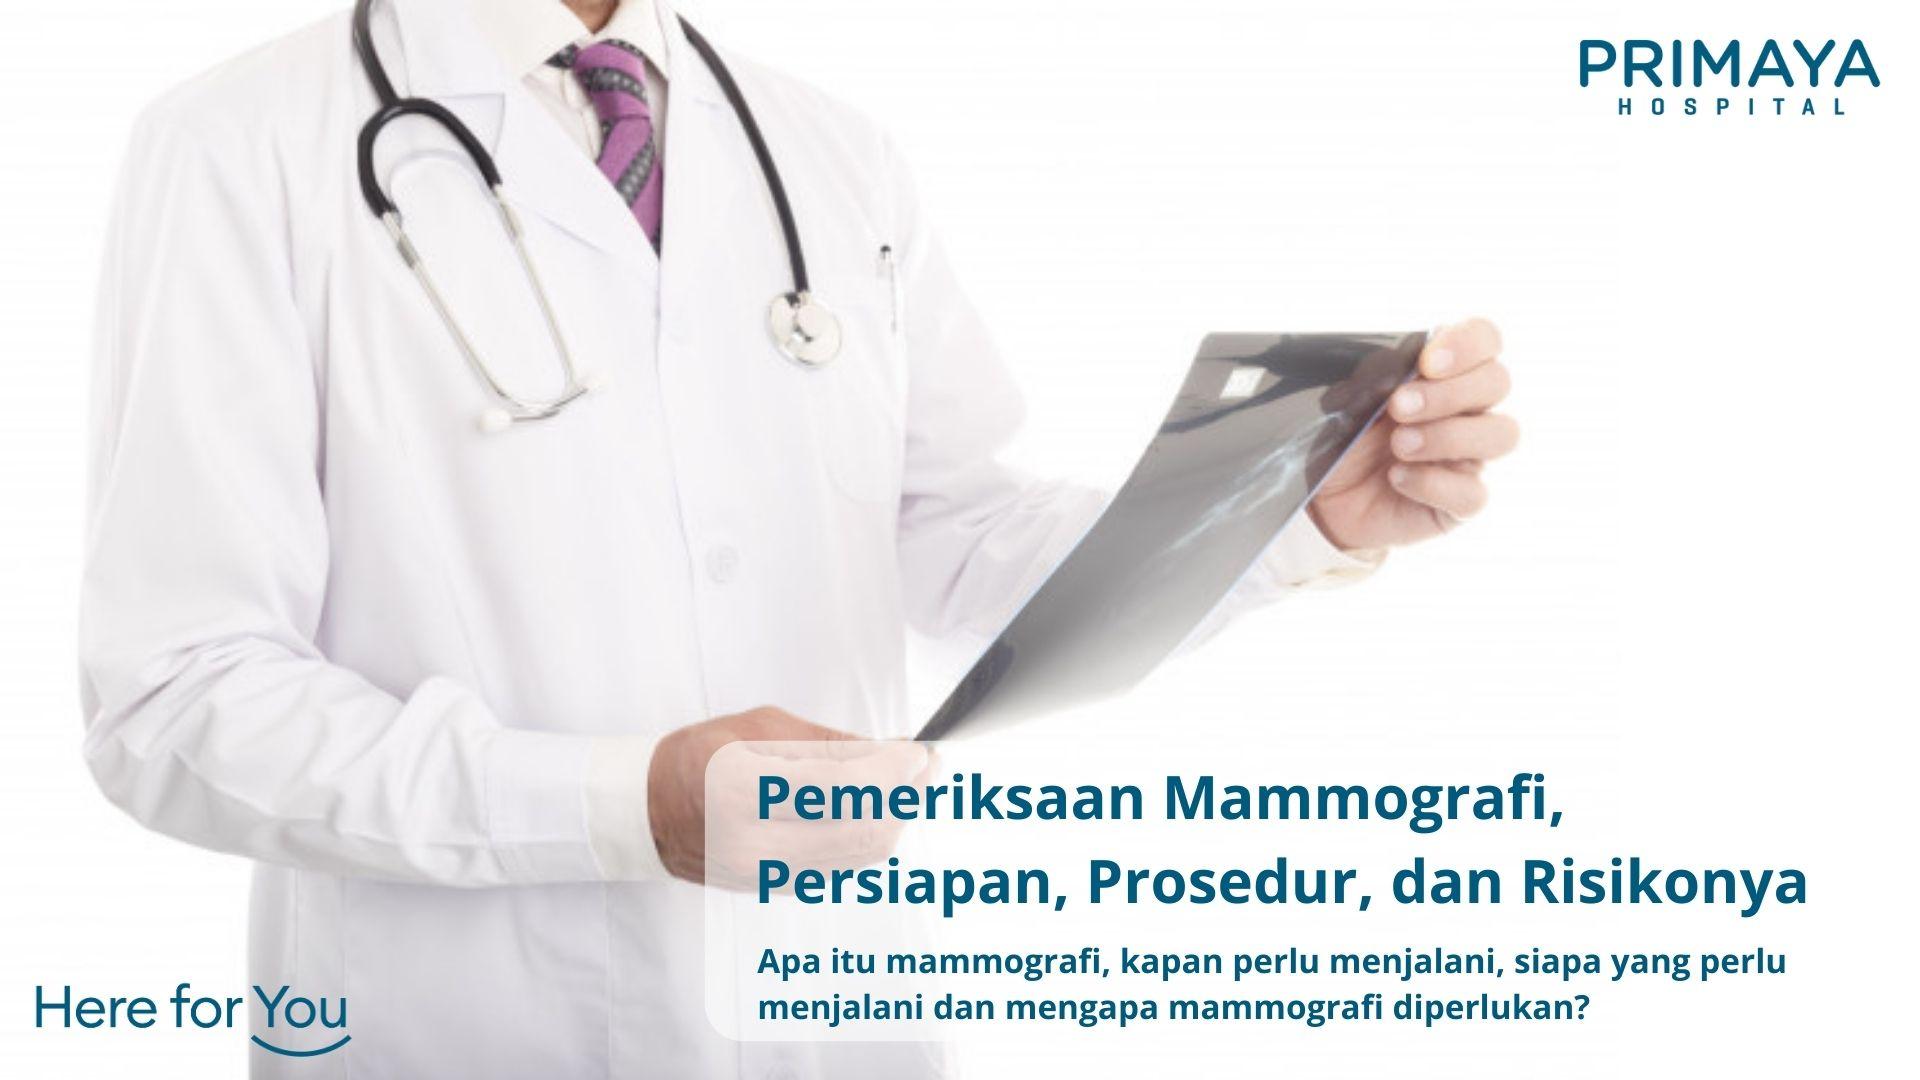 Pemeriksaan Mammografi, Persiapan, Prosedur, dan Risikonya